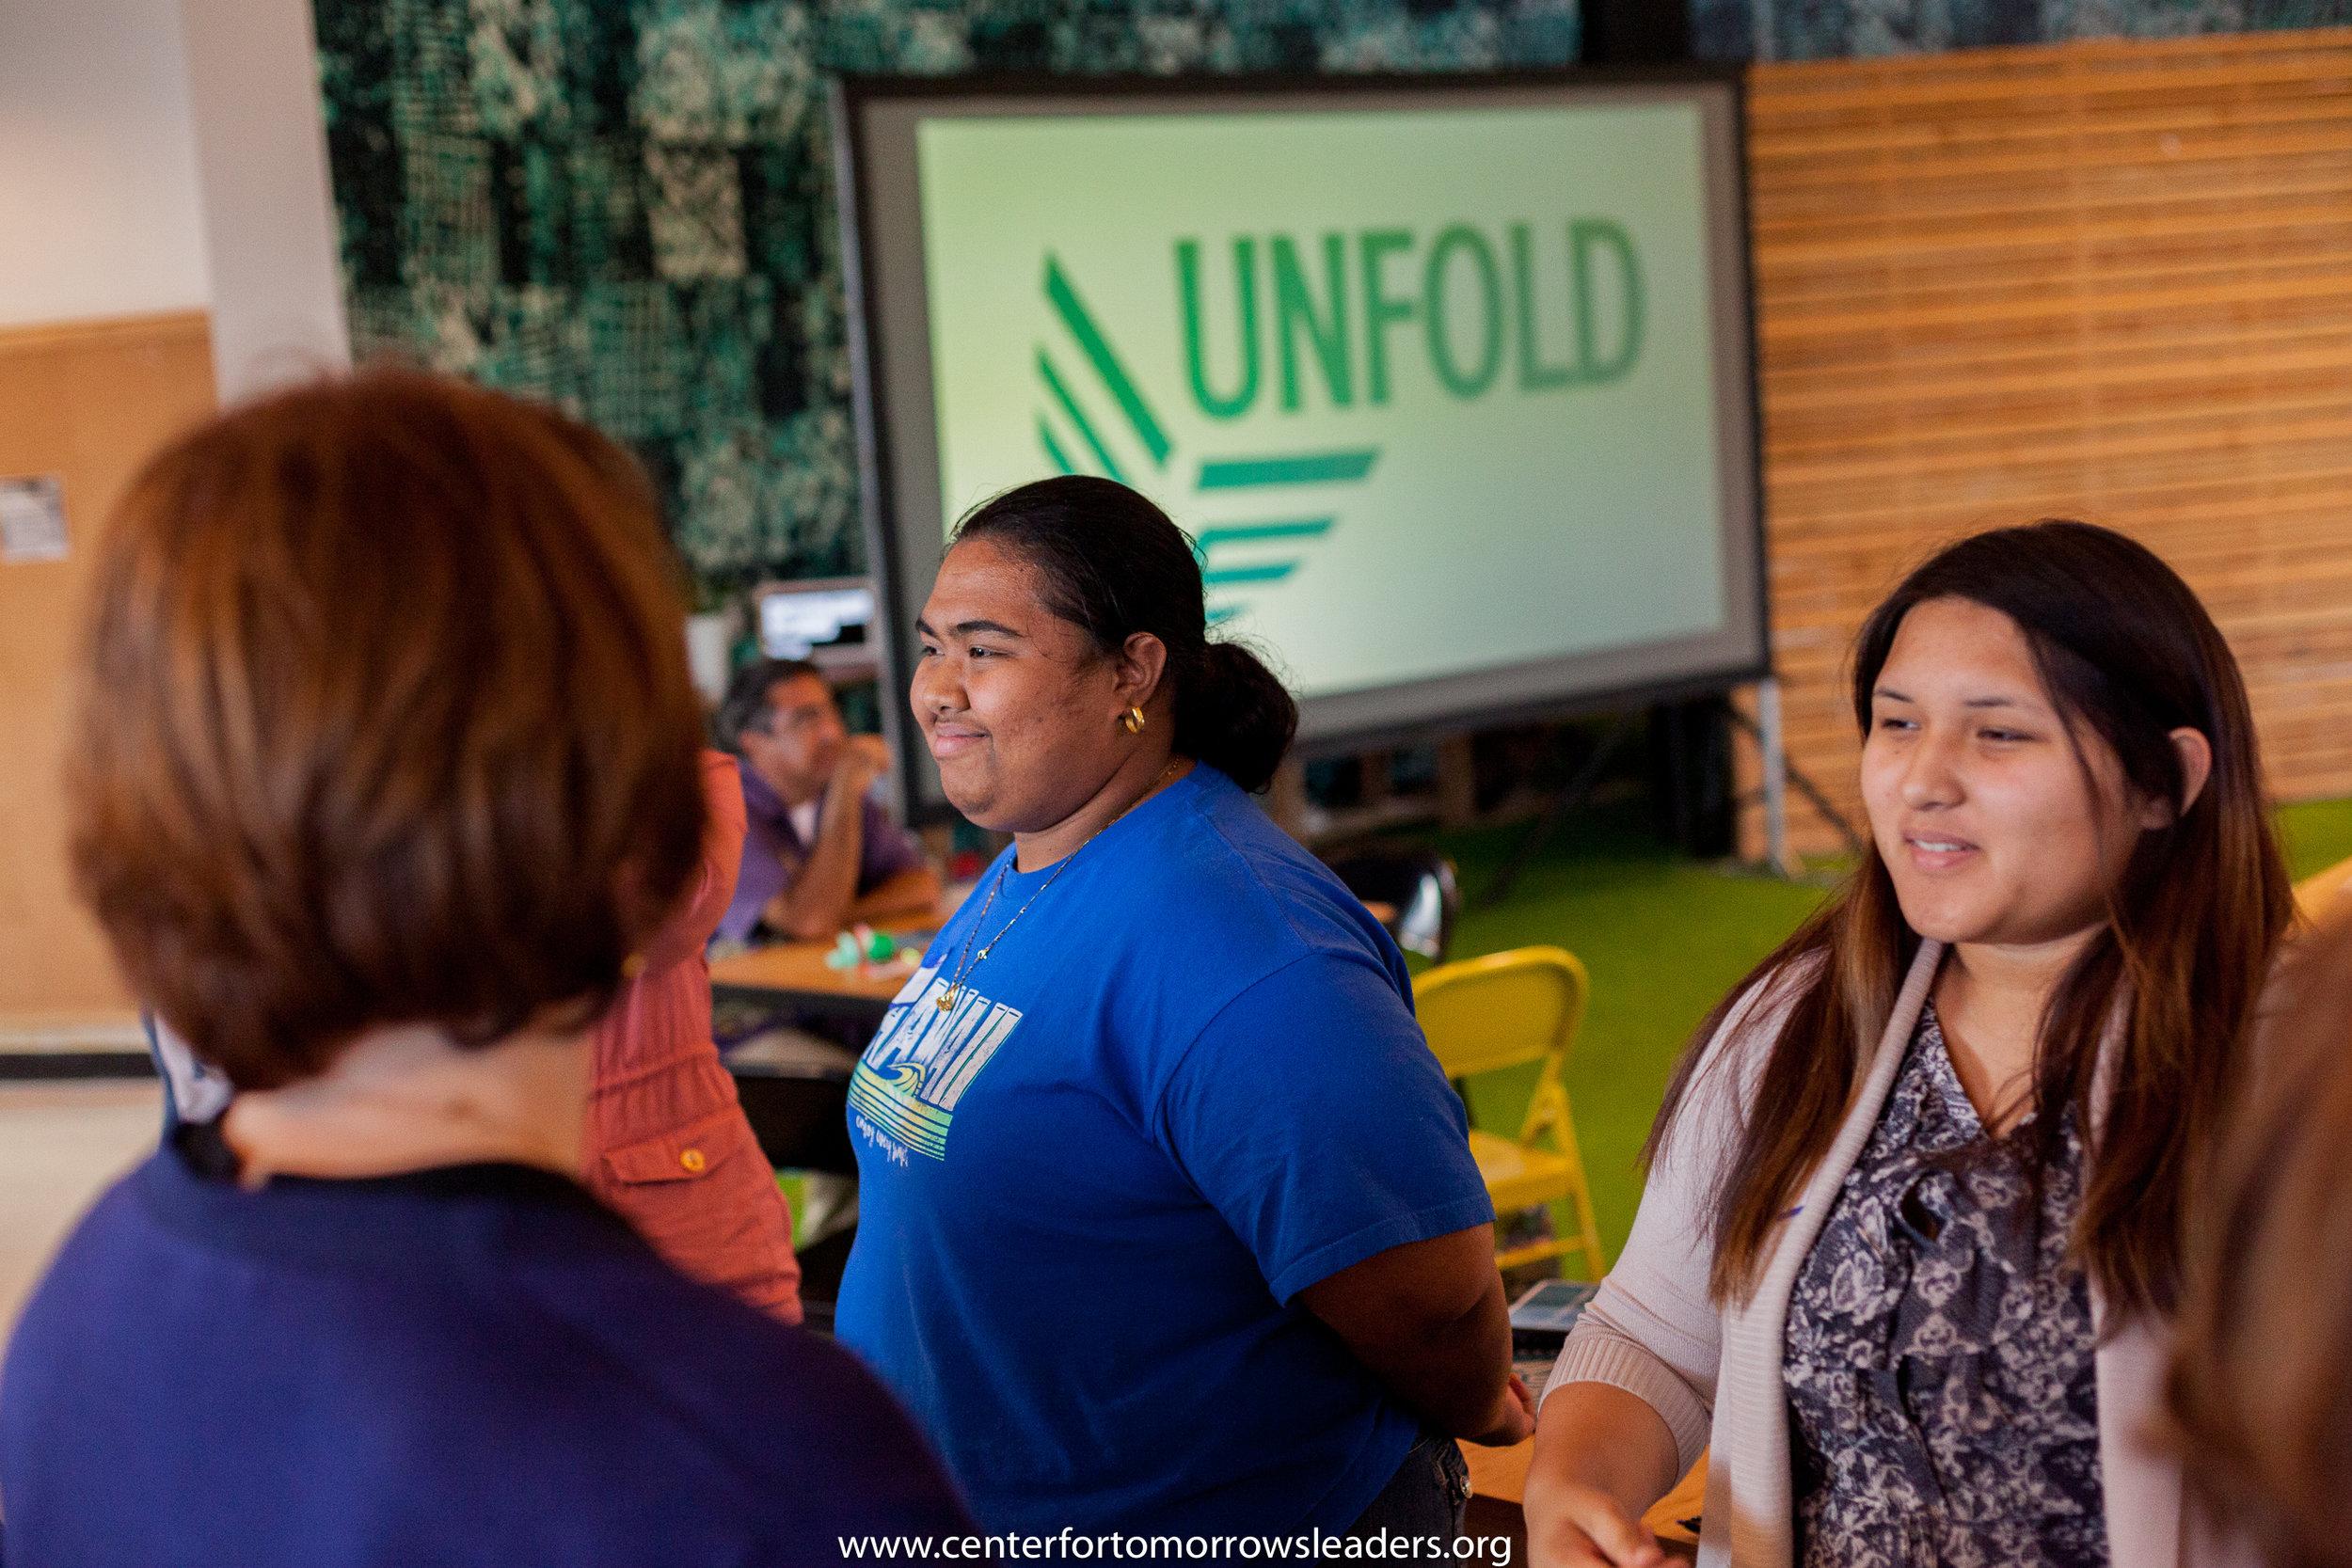 Unfold FB_056.jpg